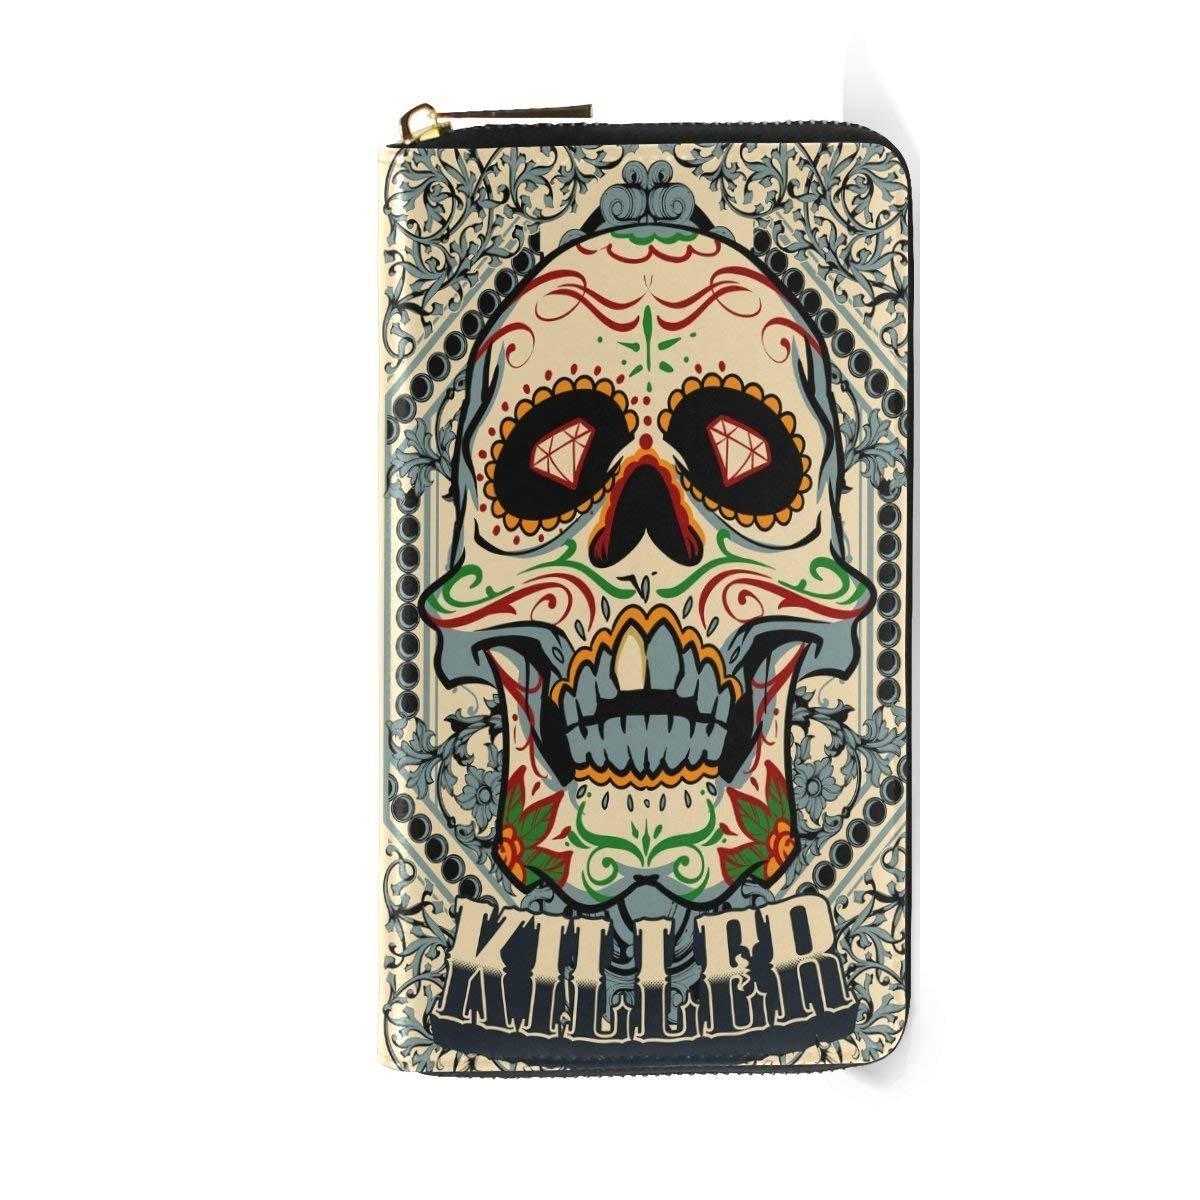 Womens Wallets Sugar Skull Zipper Passports Handbag Vintage Halloween Killer Clutch Purses